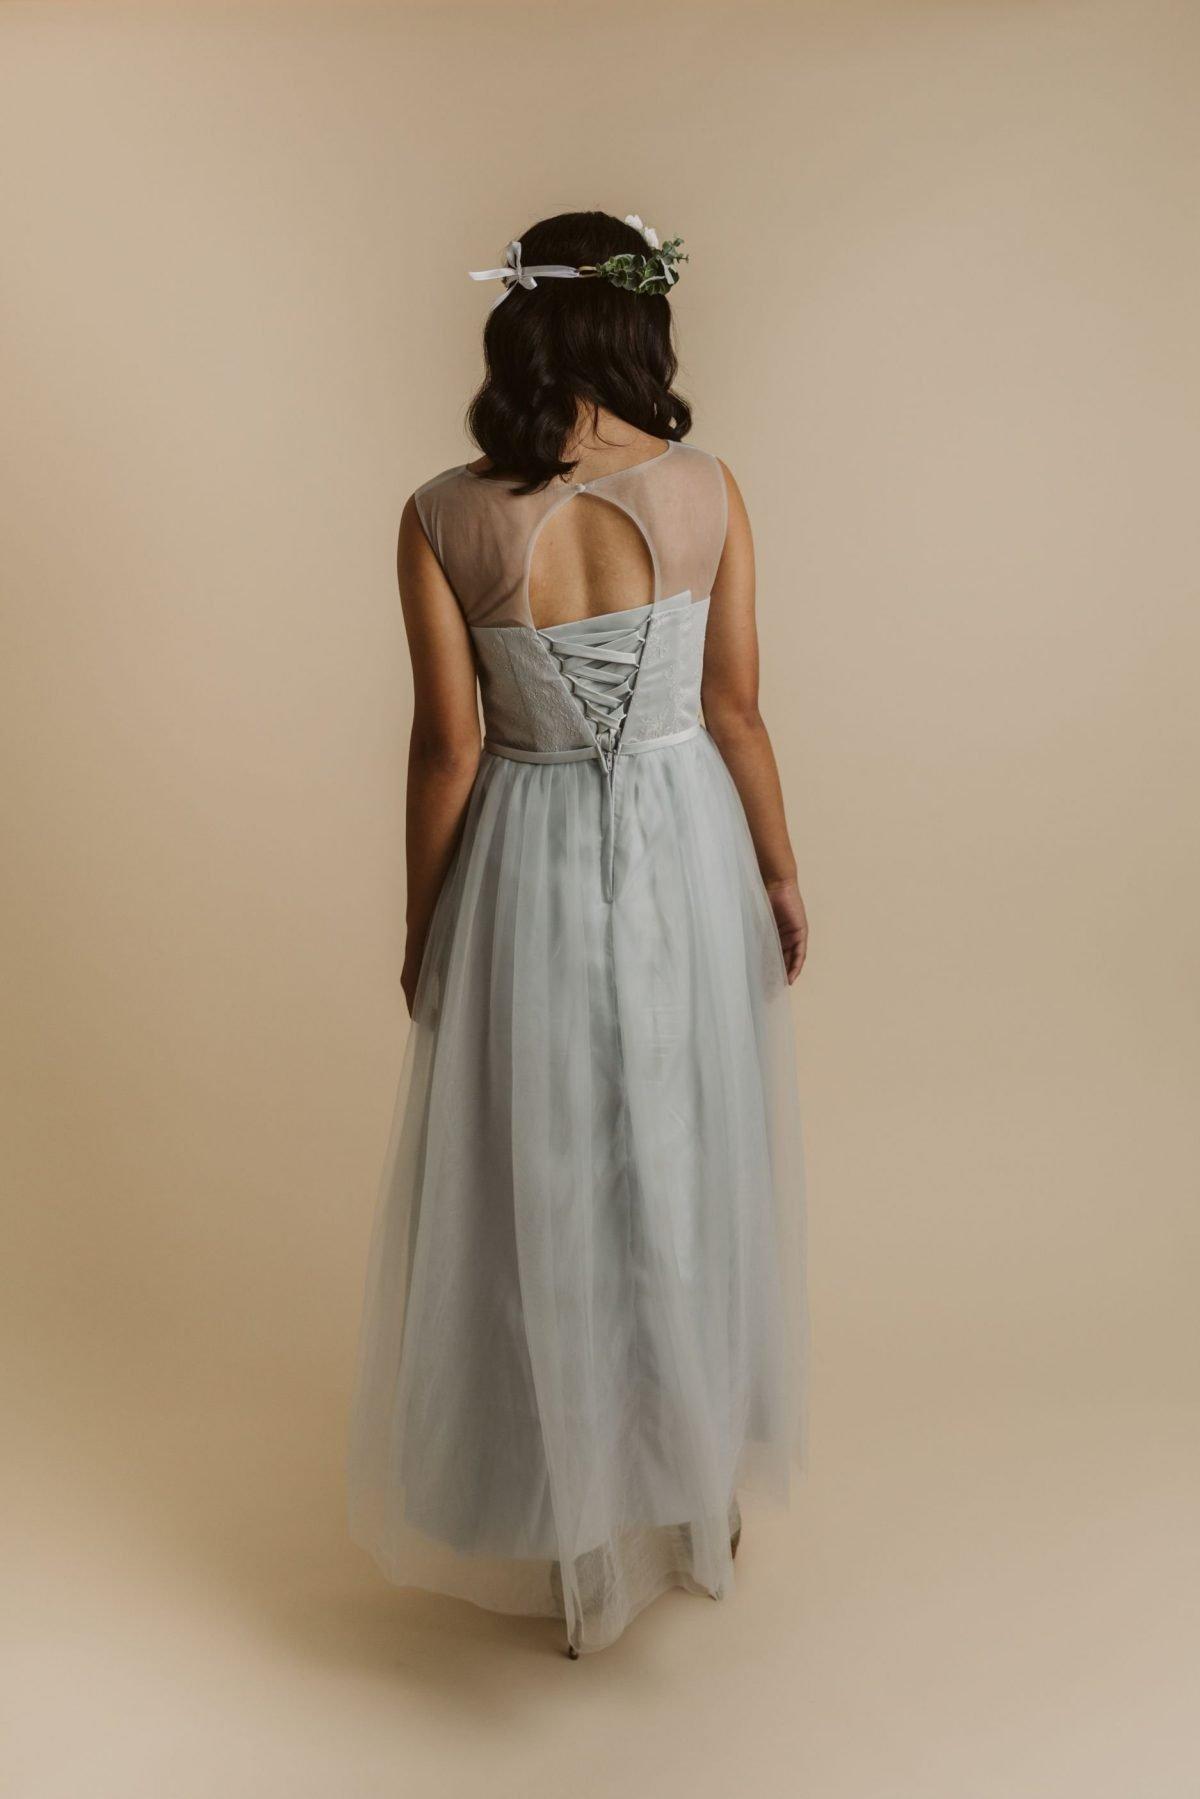 Tulle Bridesmaid Dresses Auckland